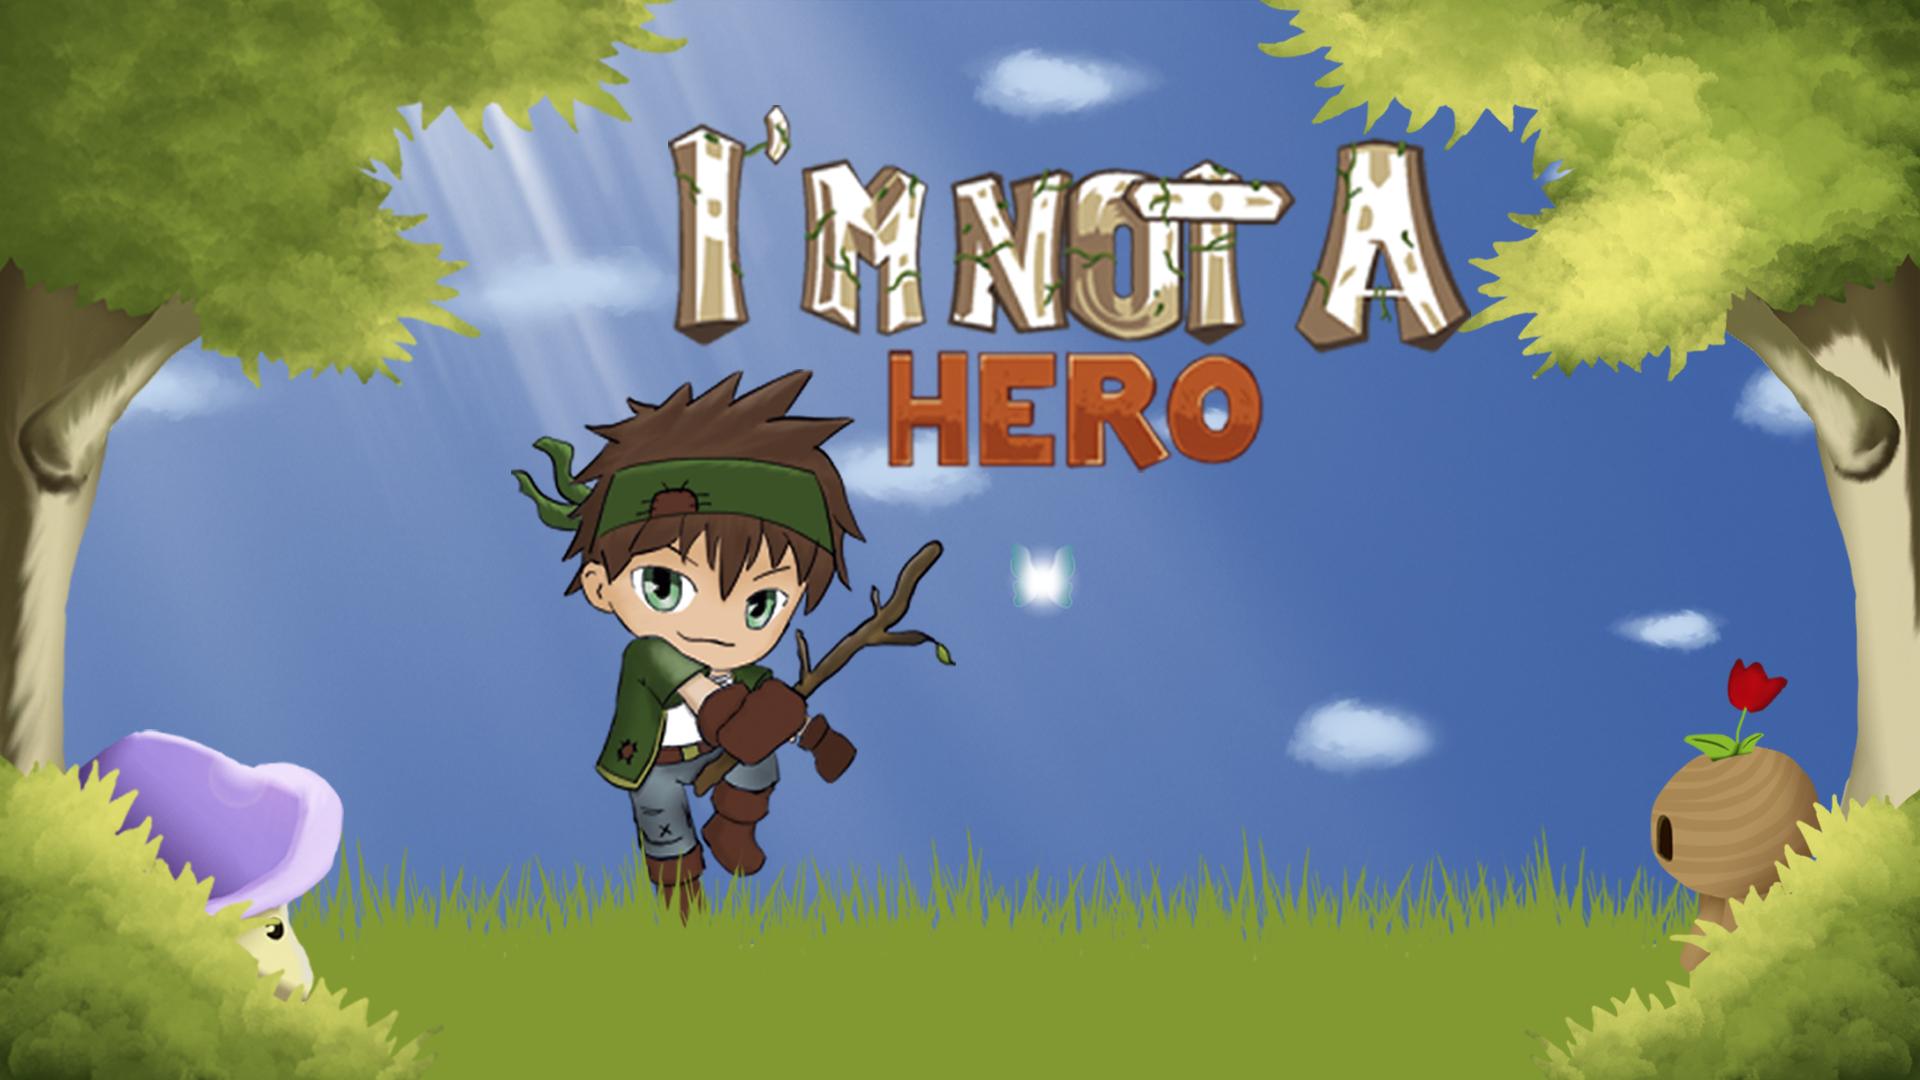 I'm Not a Hero